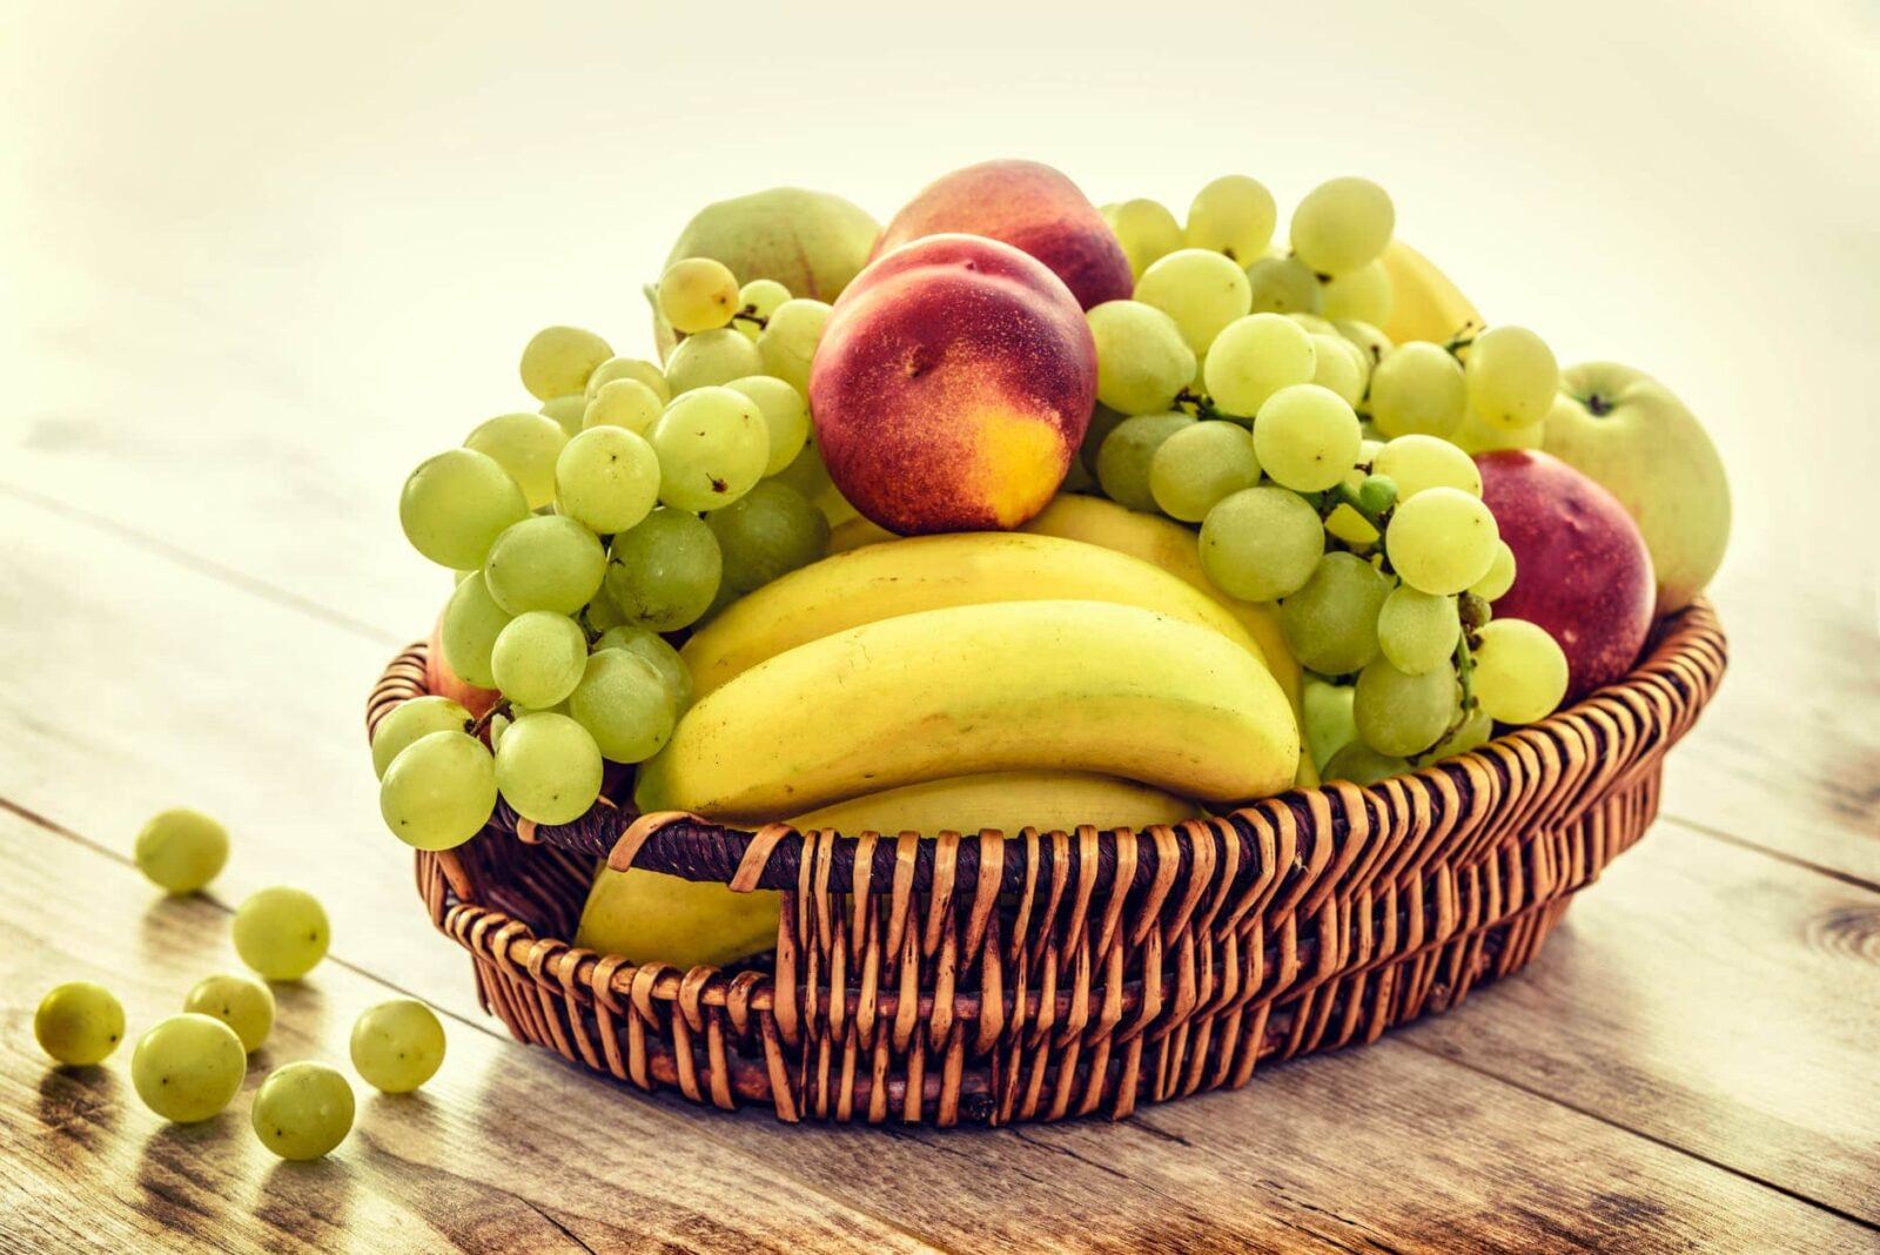 apples bananas basket bunch